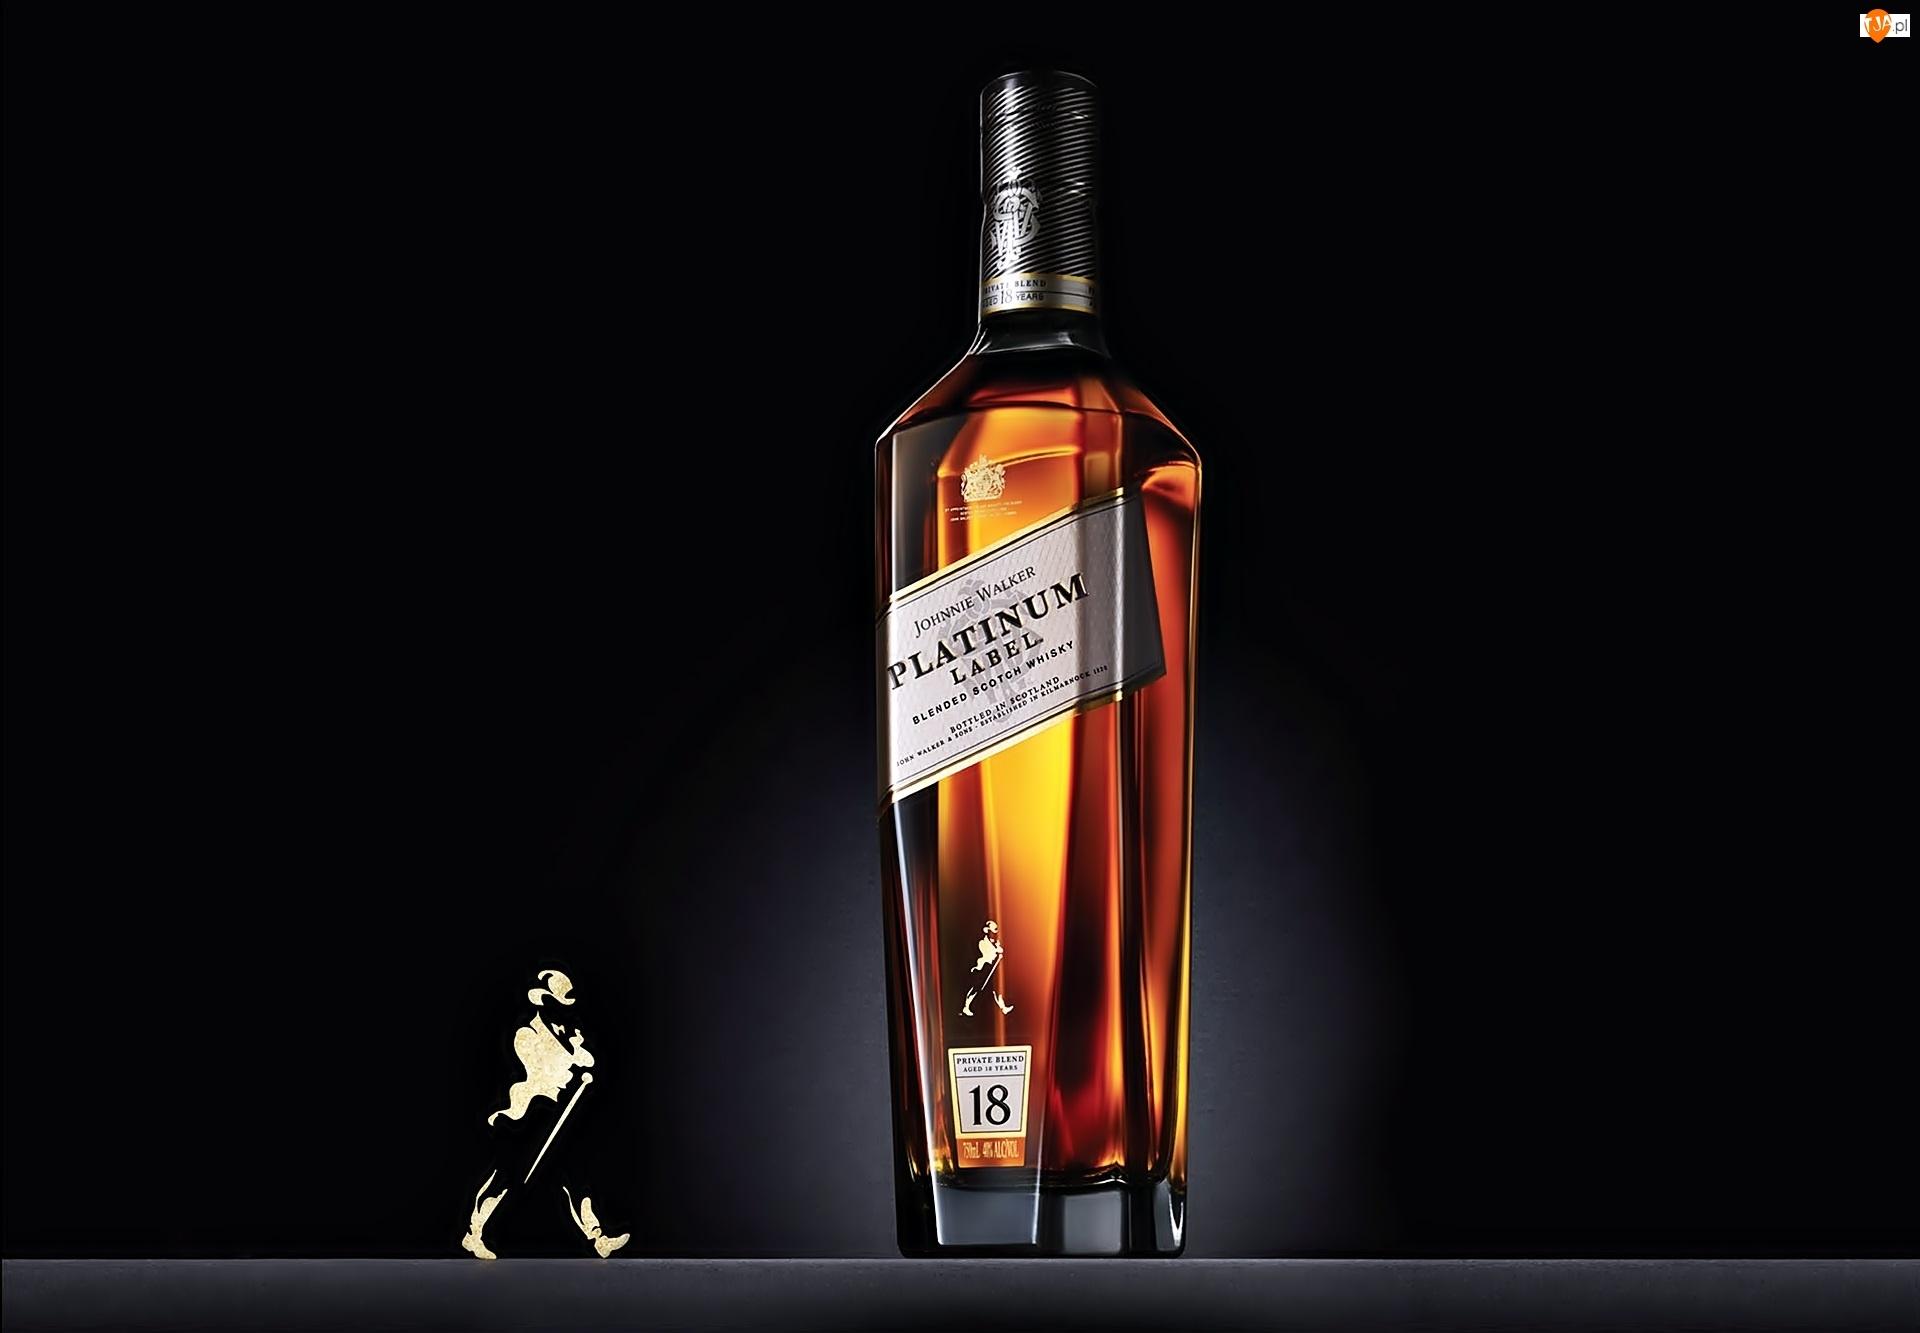 Johnnie, Platinum, Butelka, Label, Whisky, Walker